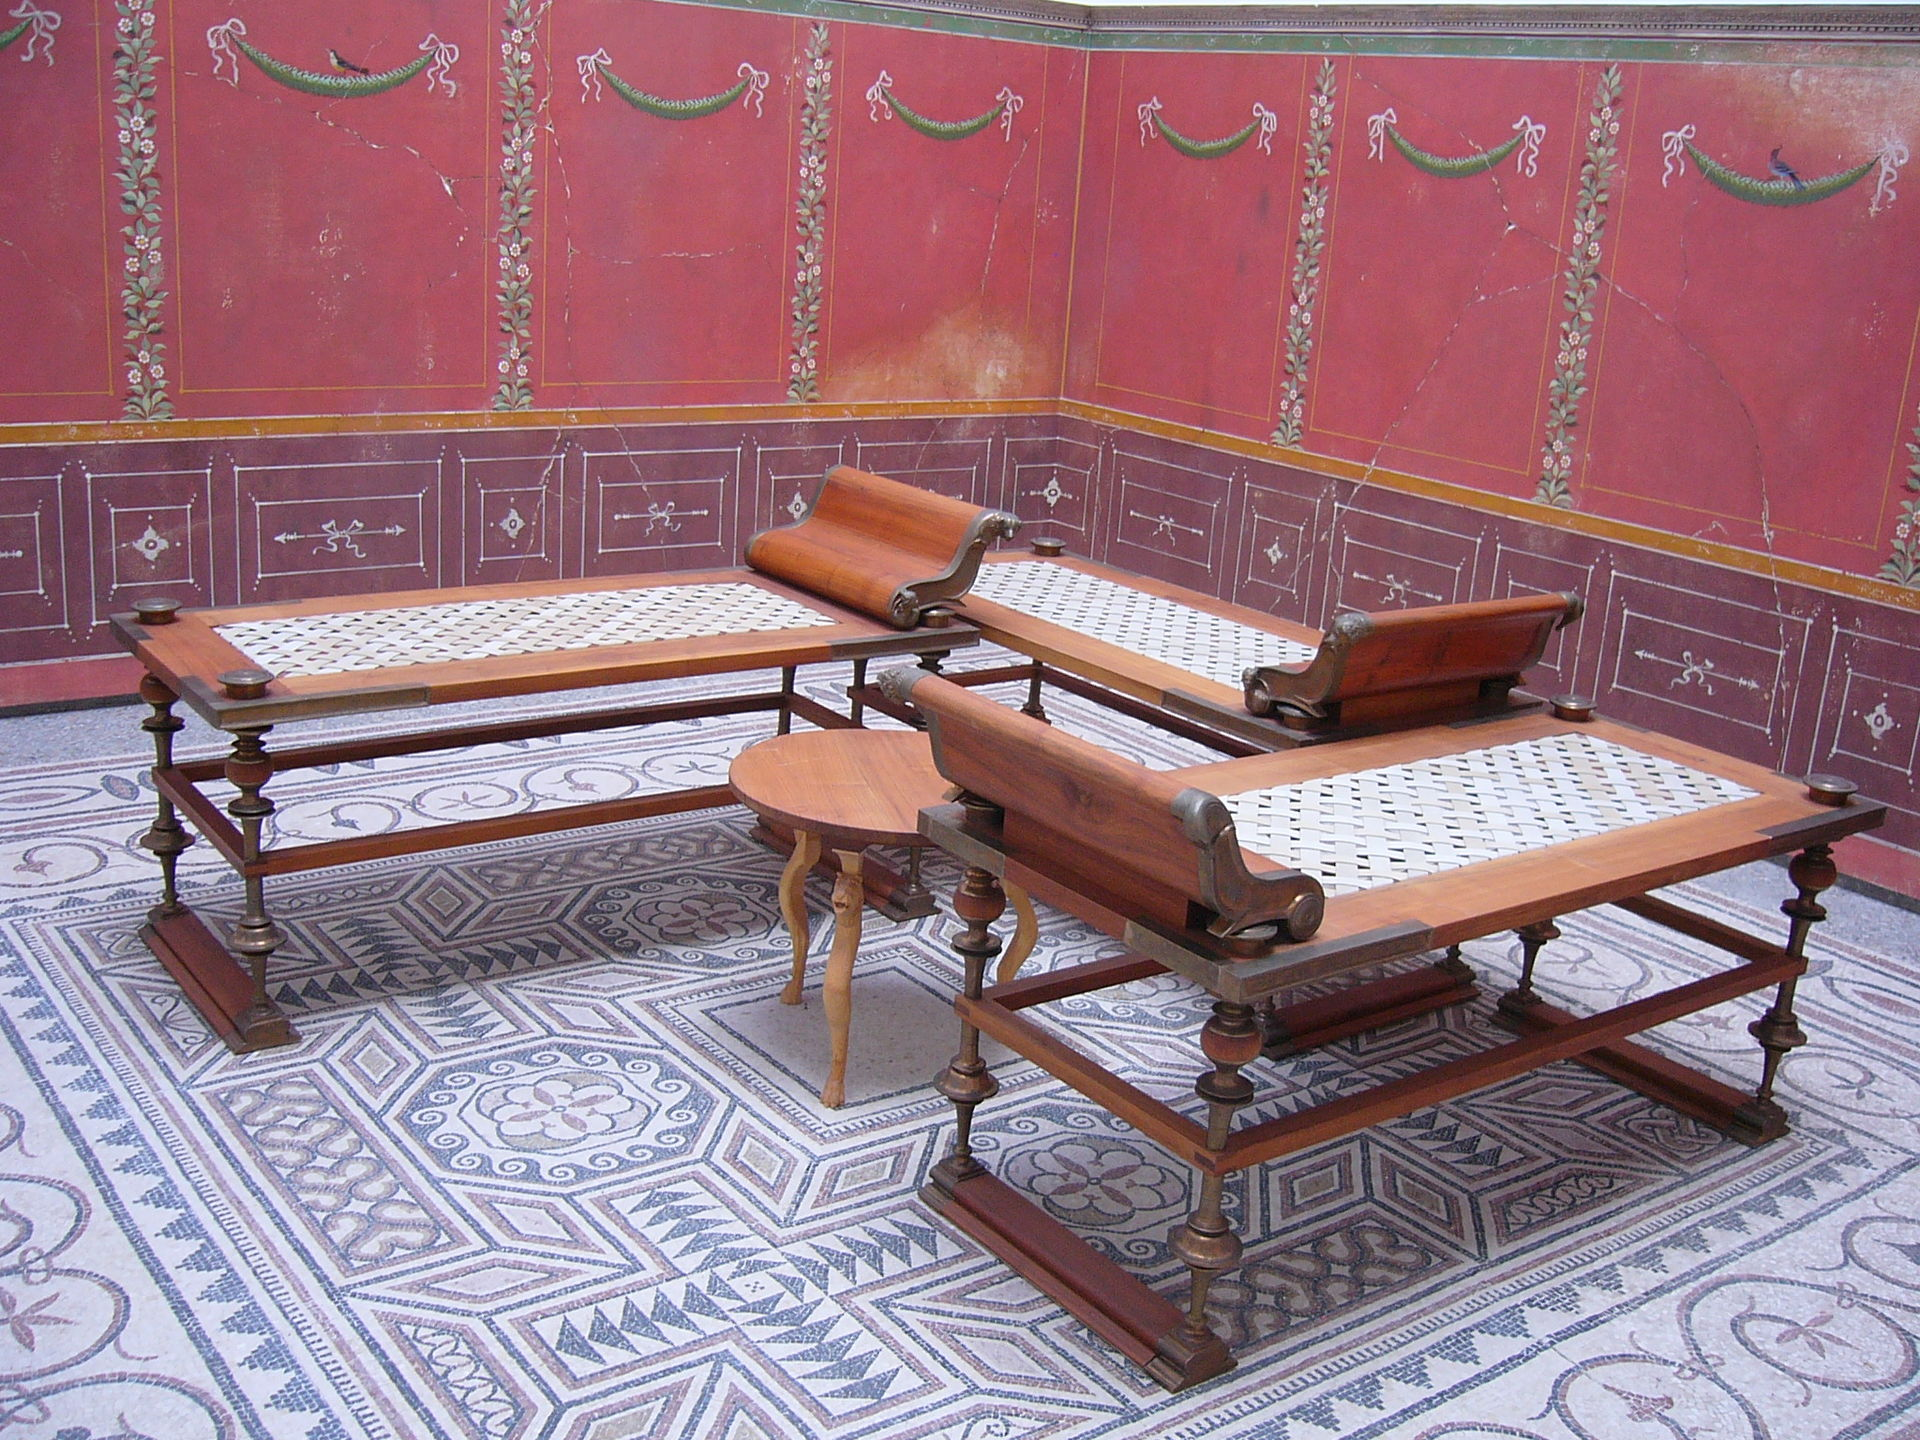 Triclinium wikipedia for Chaise longue wiki